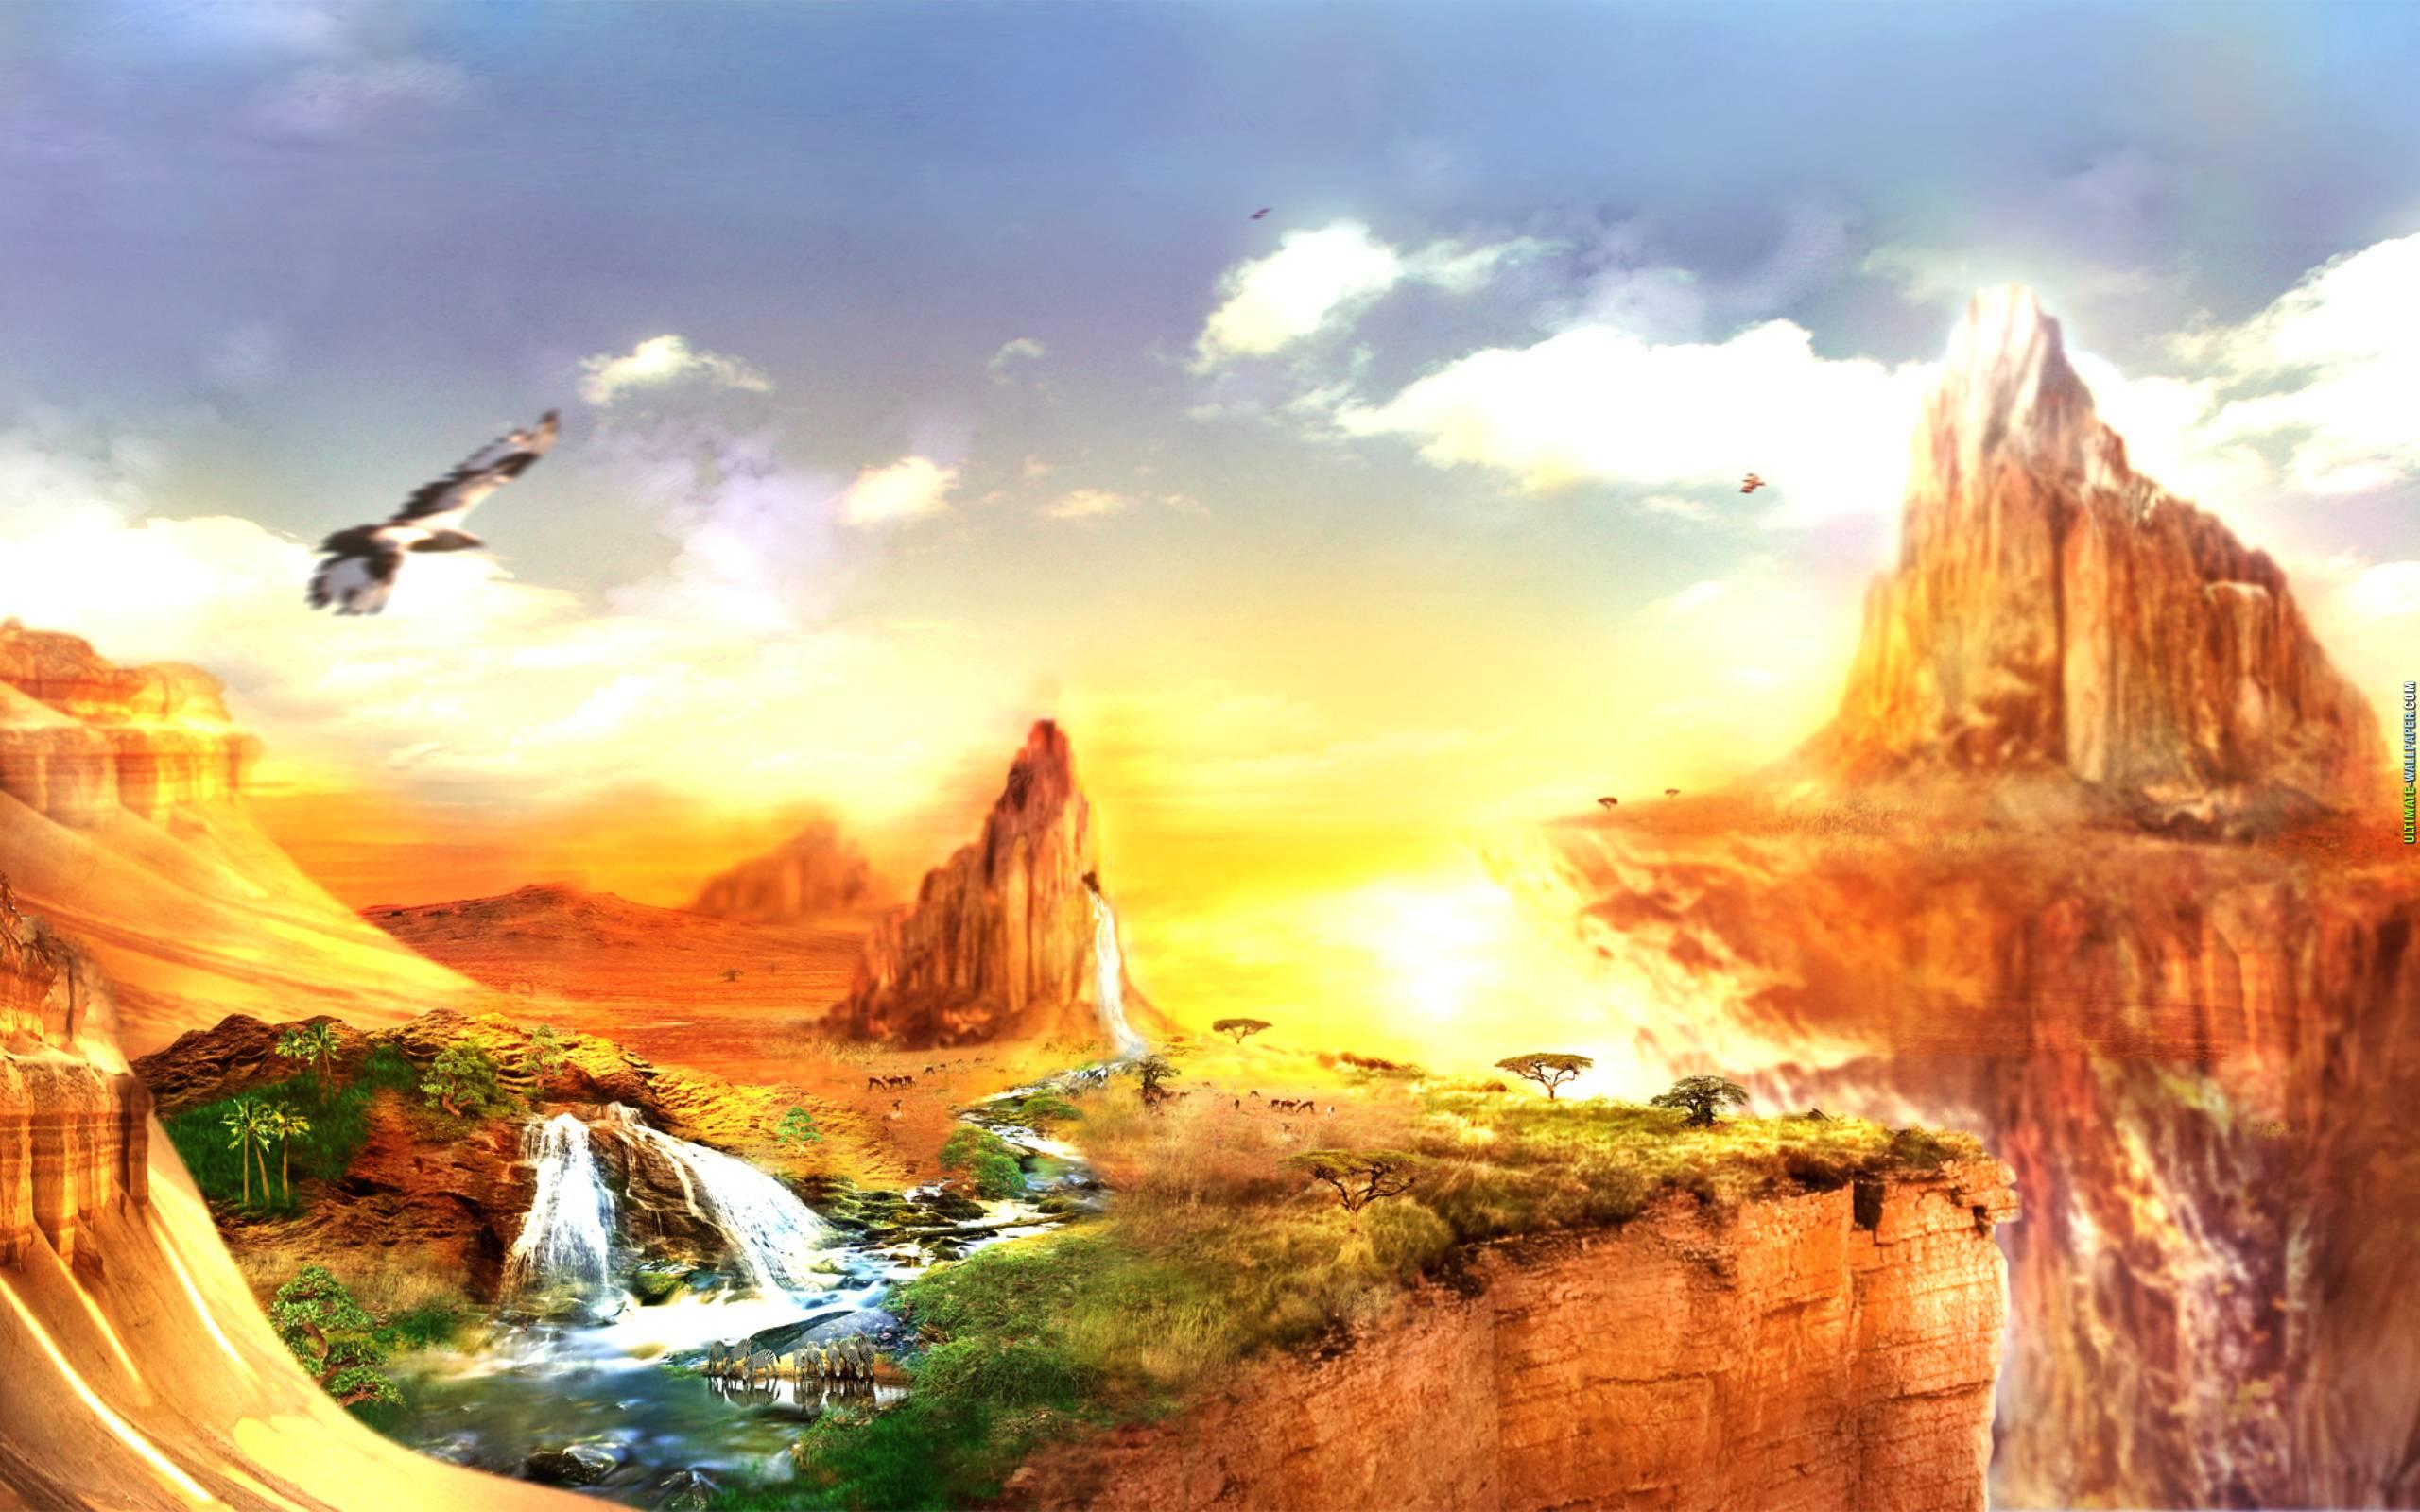 Paesaggi hd wallpaper sfondi 2560x1600 id 114814 for Sfondi desktop hd paesaggi